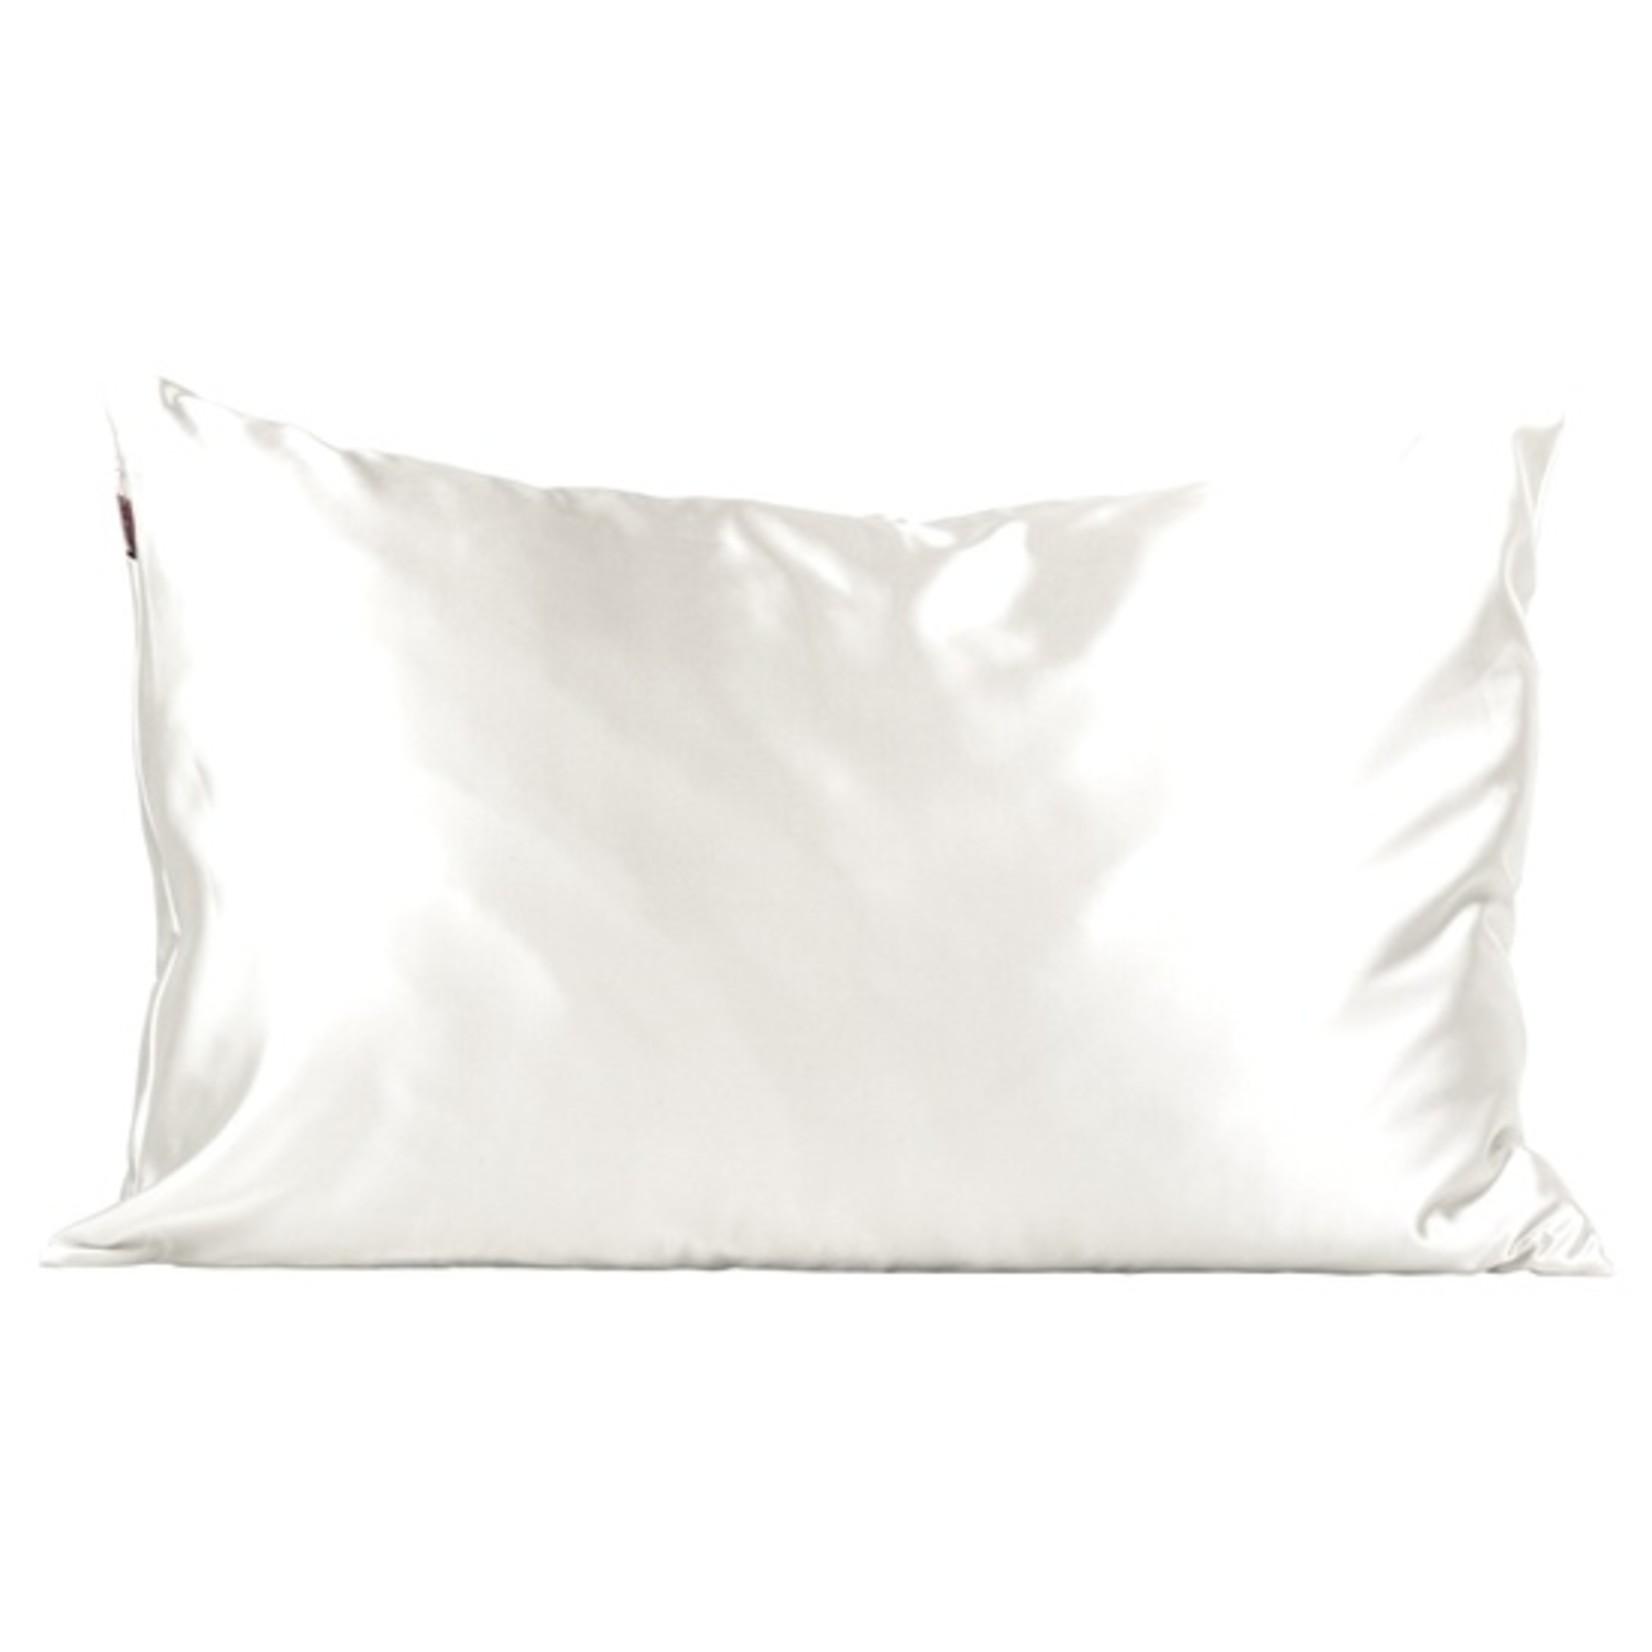 Kitsch Ivory Satin Pillowcase